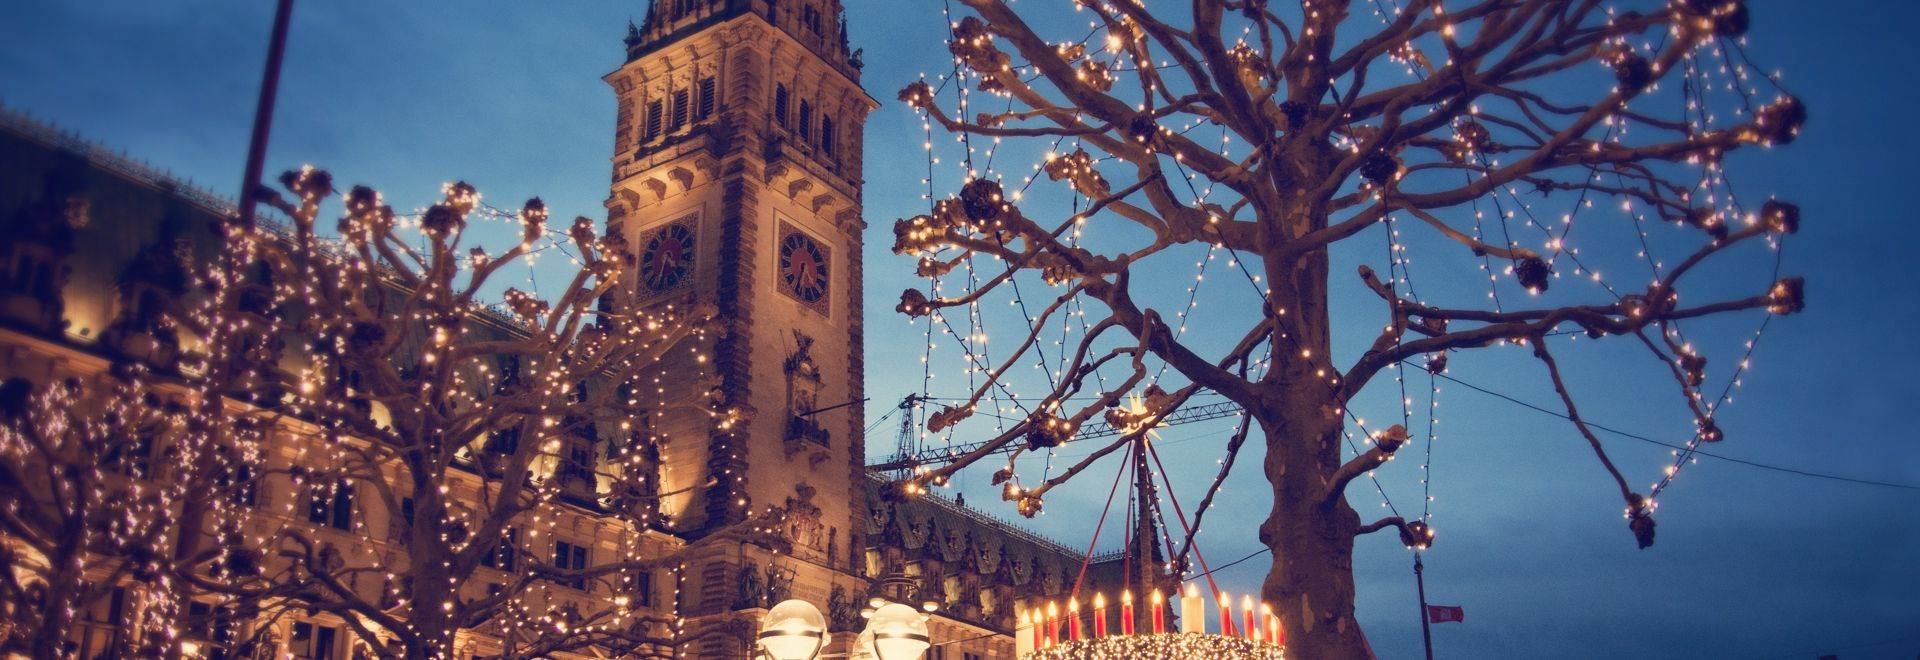 Christmas market at the Hamburg Rathaus Markt - Hamburg, Germany, 2015